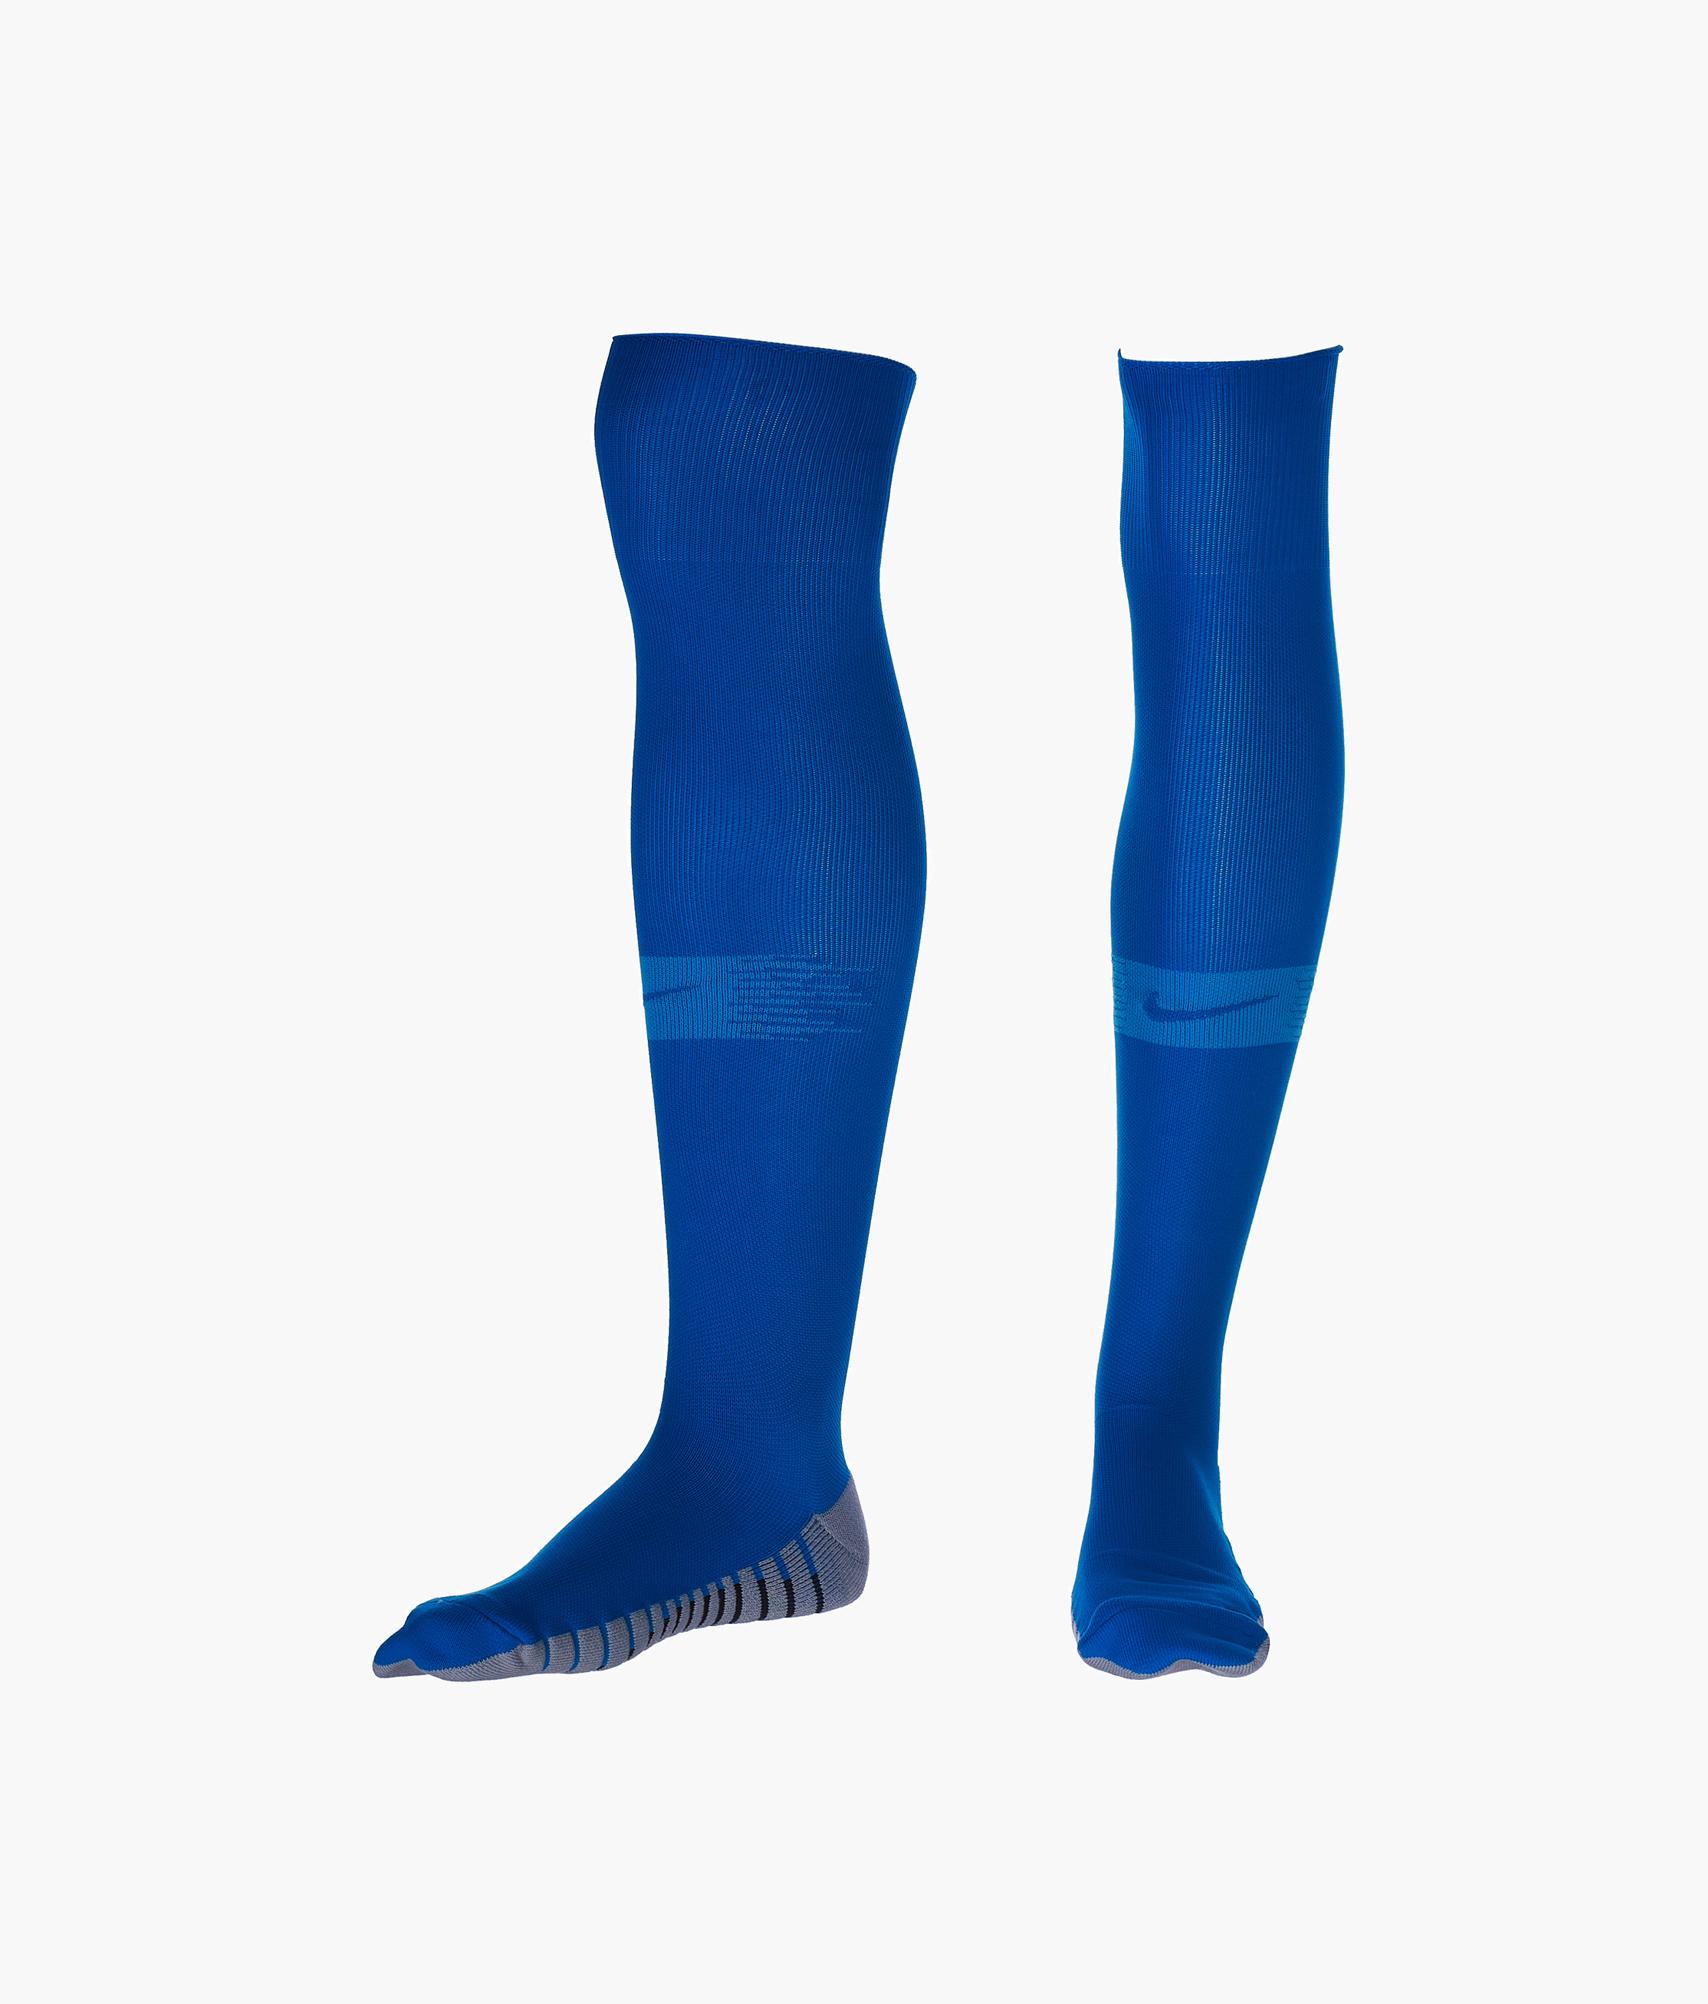 Гетры домашние Nike сезона 2018/2019 Nike Цвет-Синий